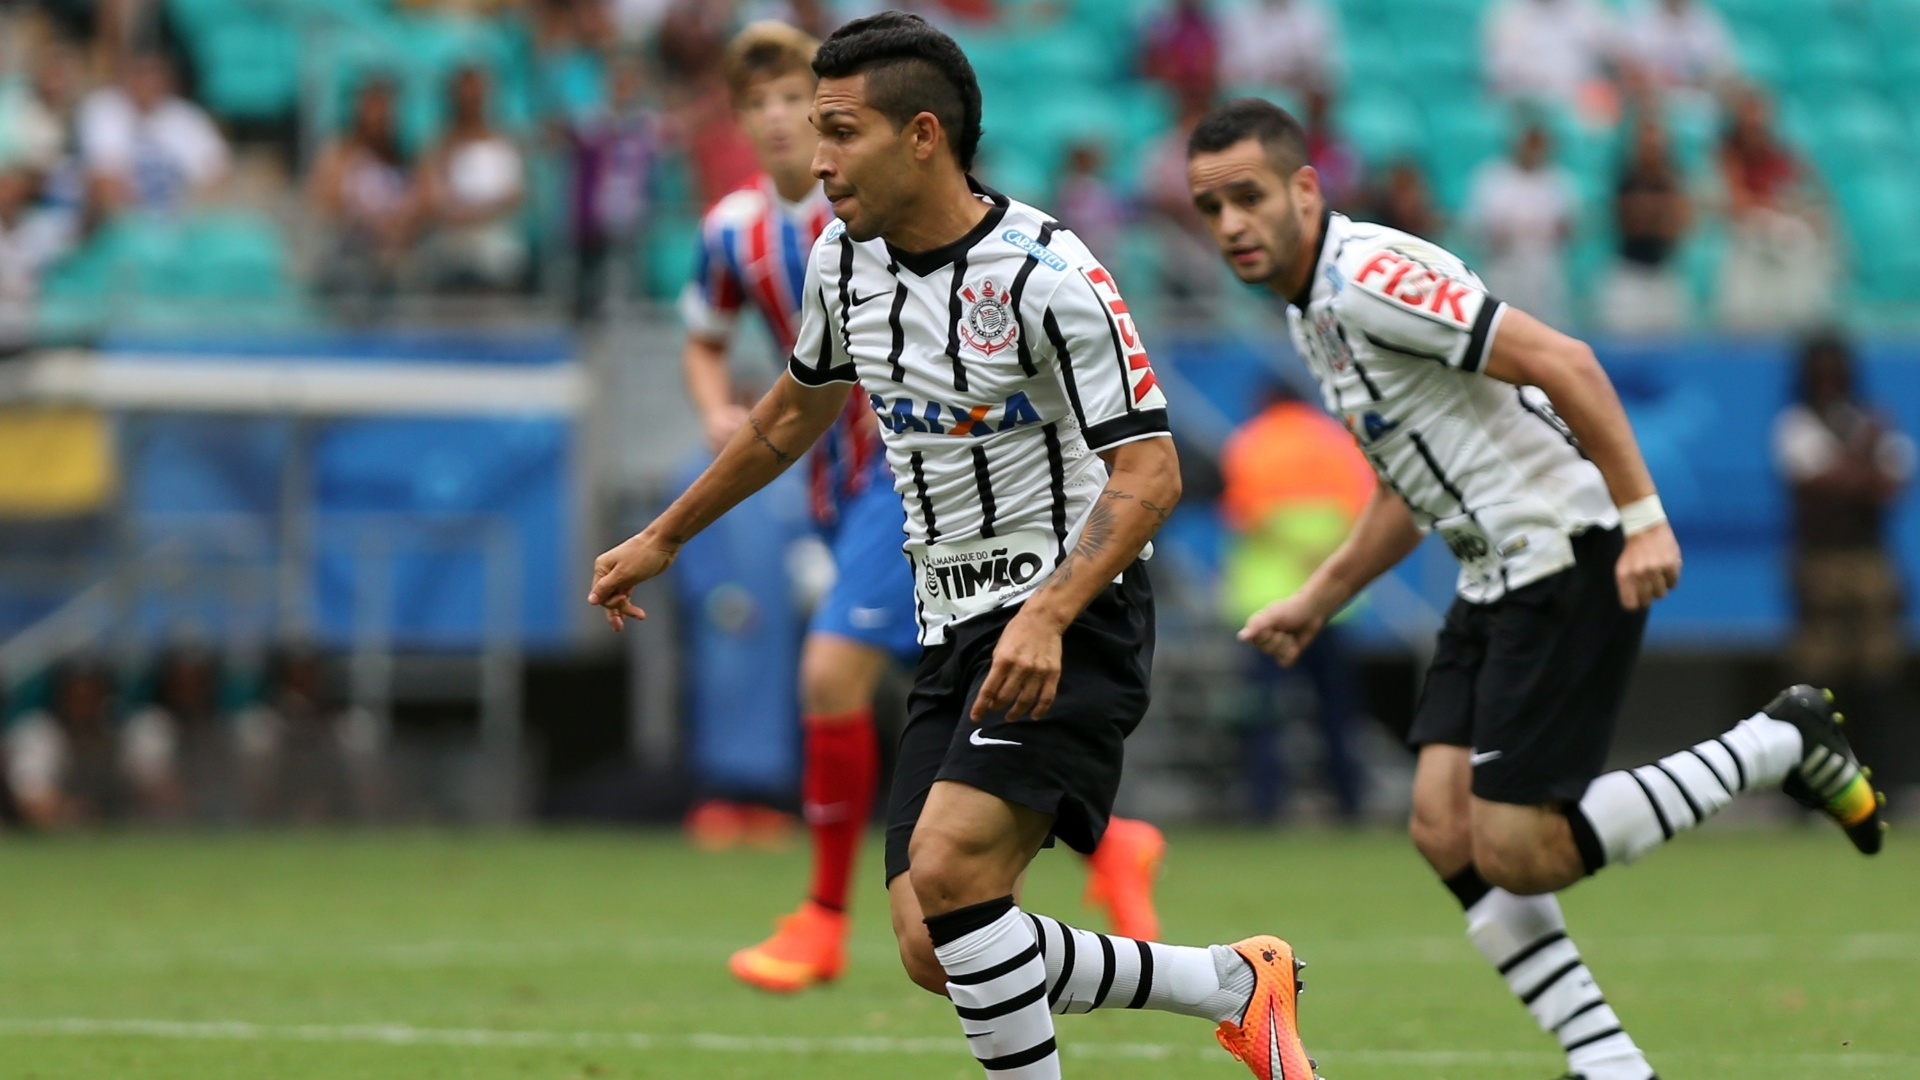 Corintiano Petros conduz a bola durante partida da equipe contra o Bahia